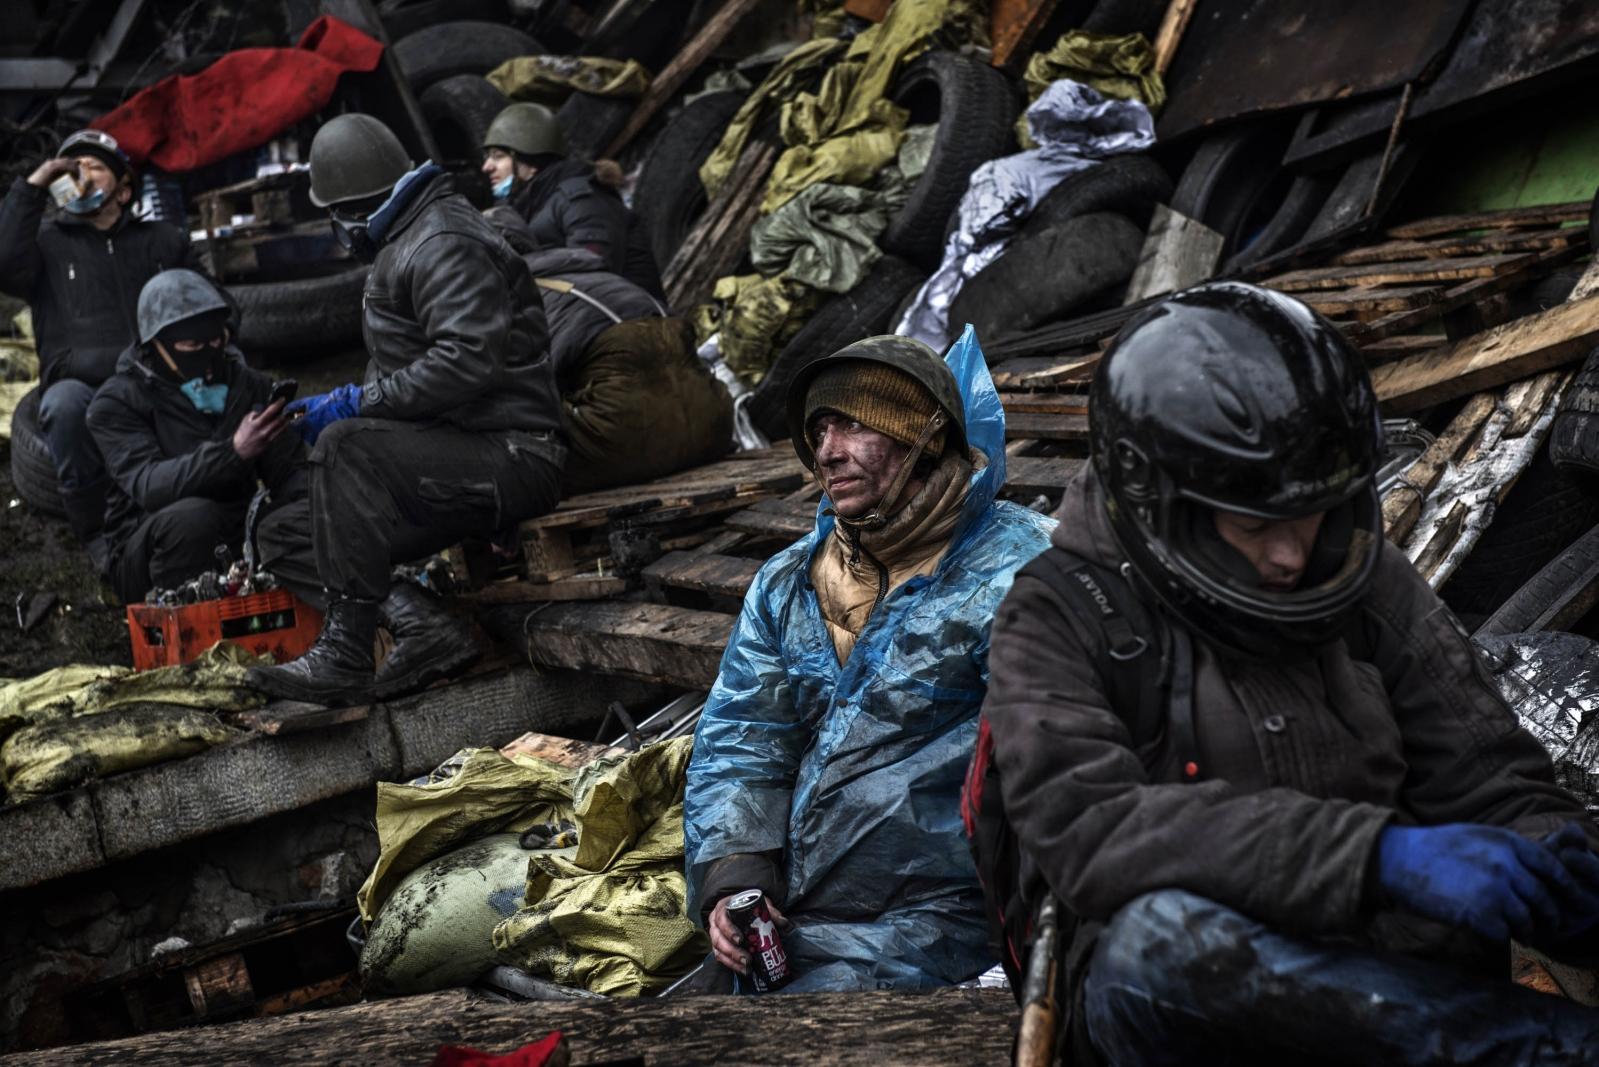 Art and Documentary Photography - Loading Behind_Kiev_s_barricades_044.jpg